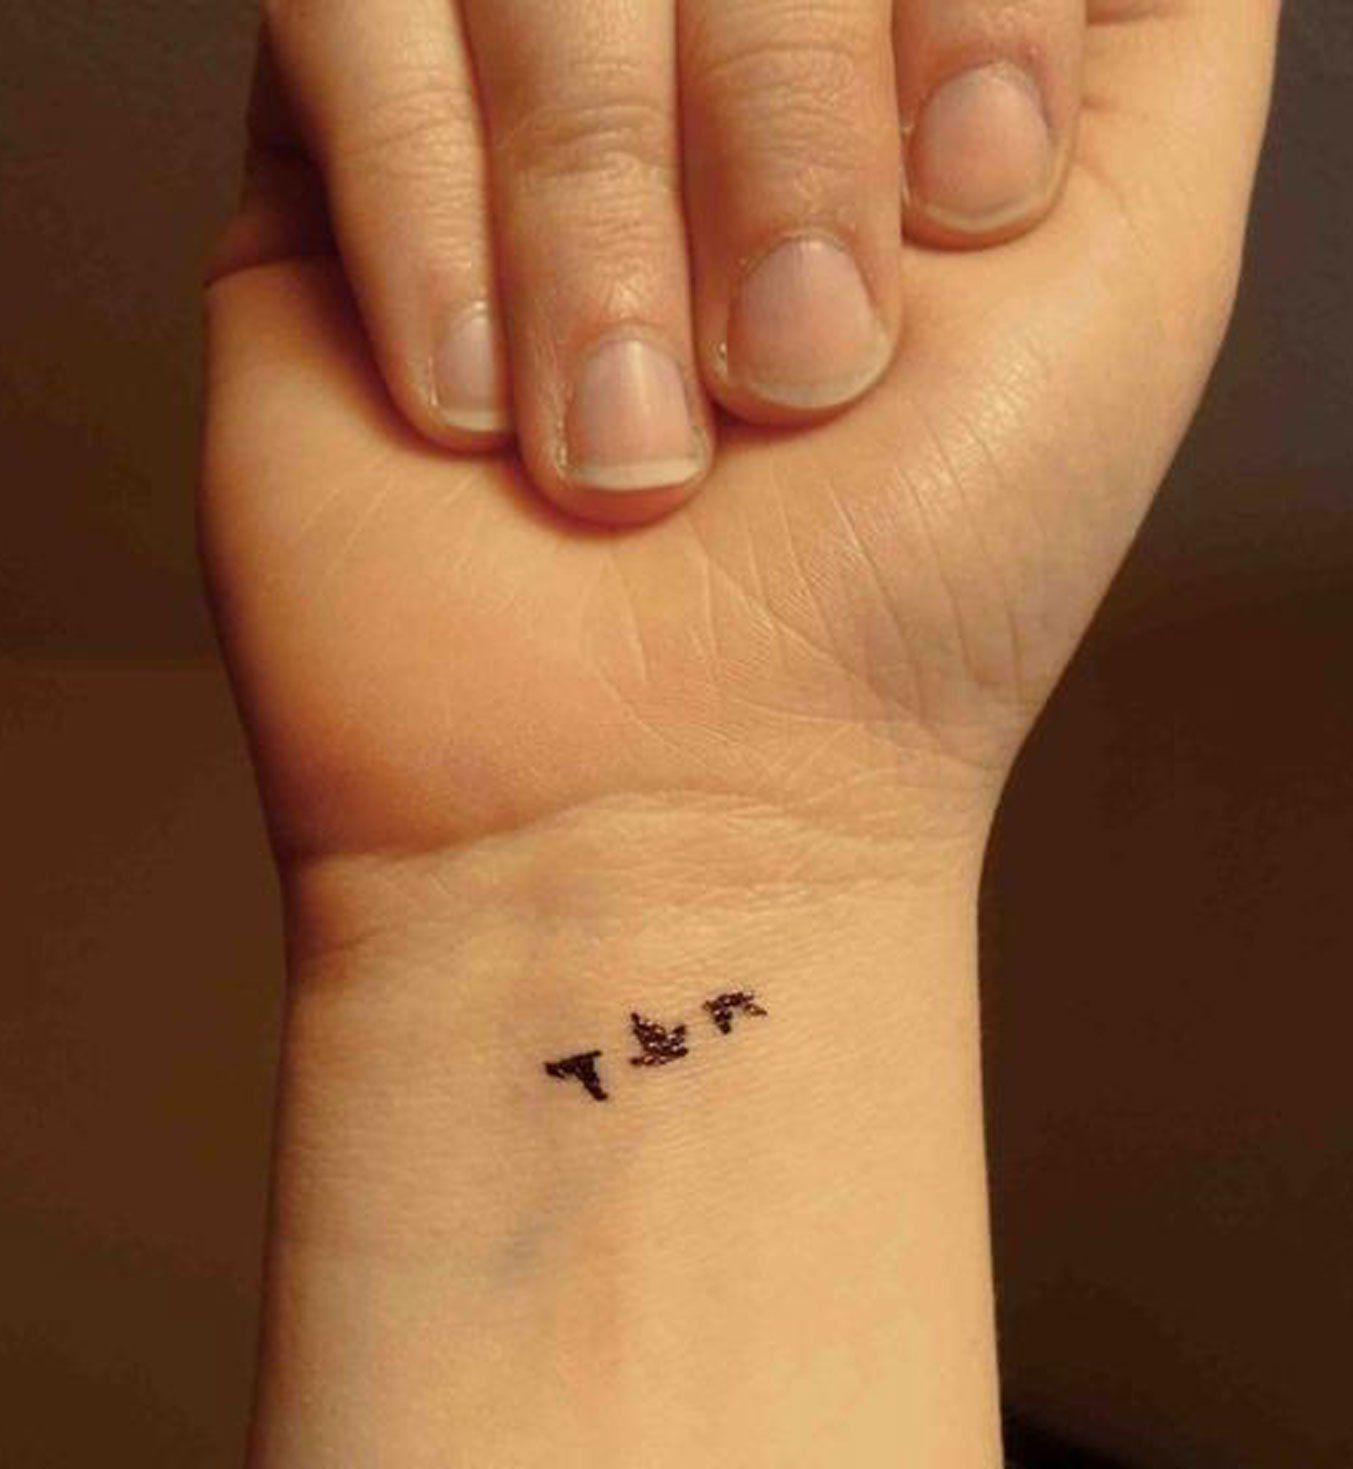 le micro tatouage le petit tattoo discret qui va vous. Black Bedroom Furniture Sets. Home Design Ideas